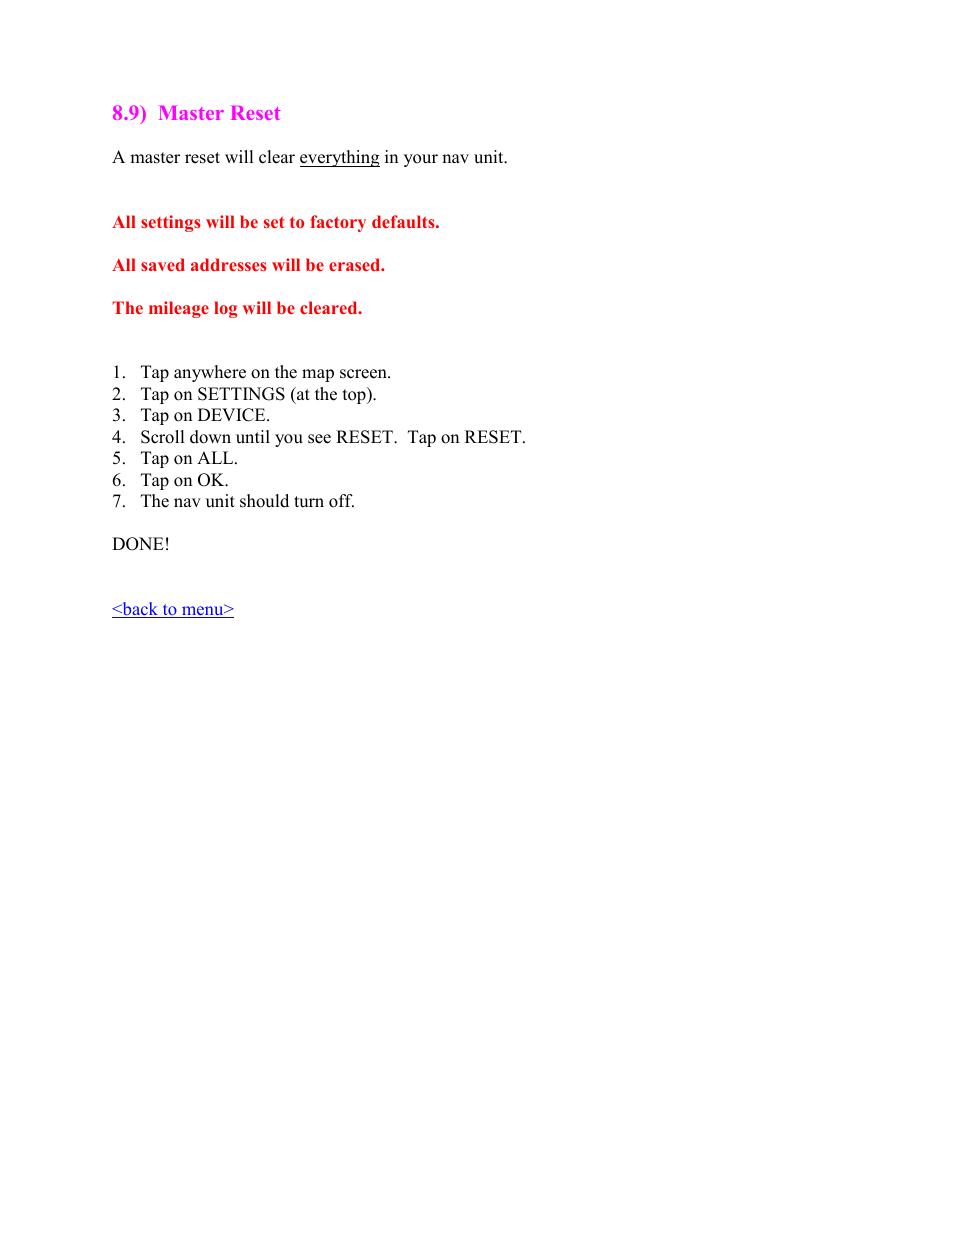 Cobra manual array cobra 7750 plt manual various owner manual guide u2022 rh justk co fandeluxe Gallery